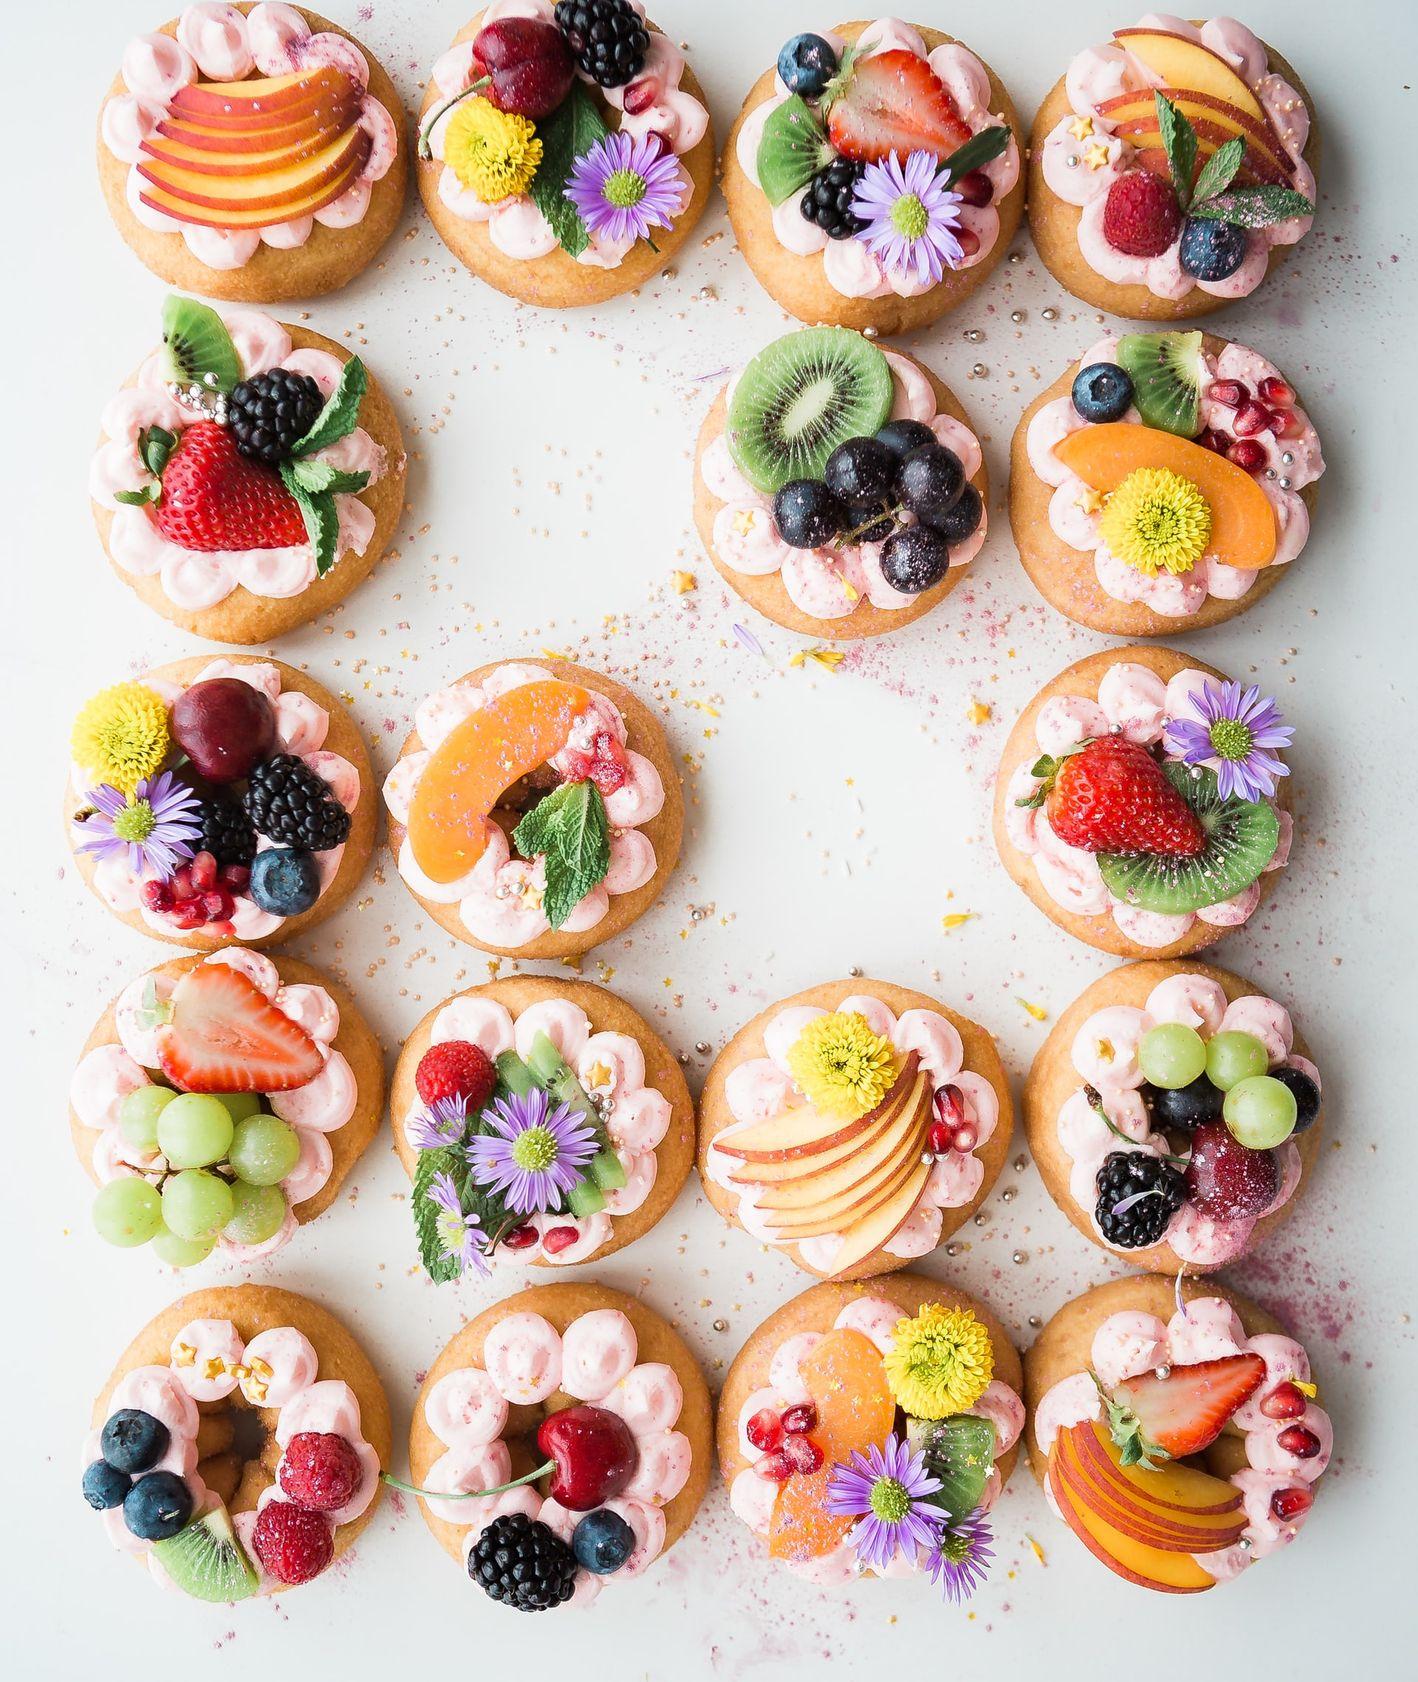 Placki z owocami i kremem (fot. Brooke Lark / unsplash.com)